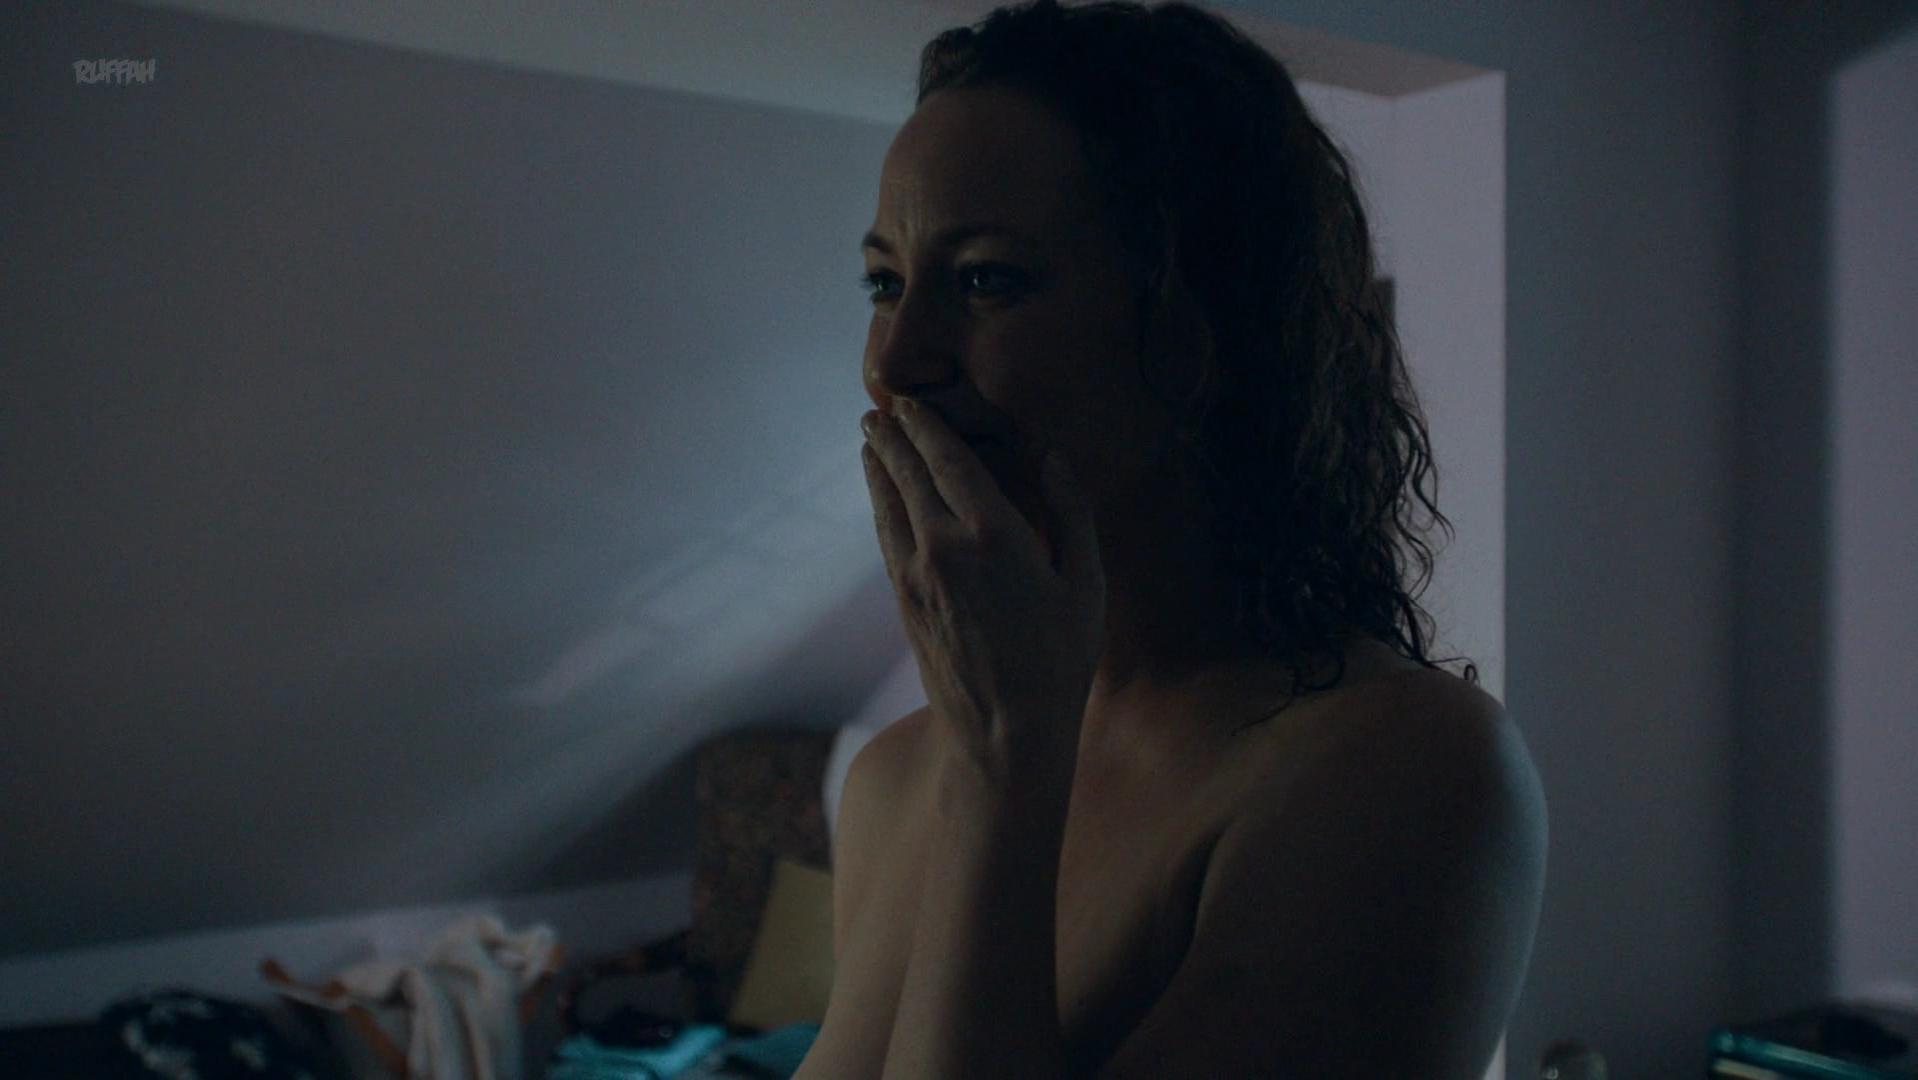 Rebecca Spence nude, Jessie Pinnick sexy - Princess Cyd (2017)